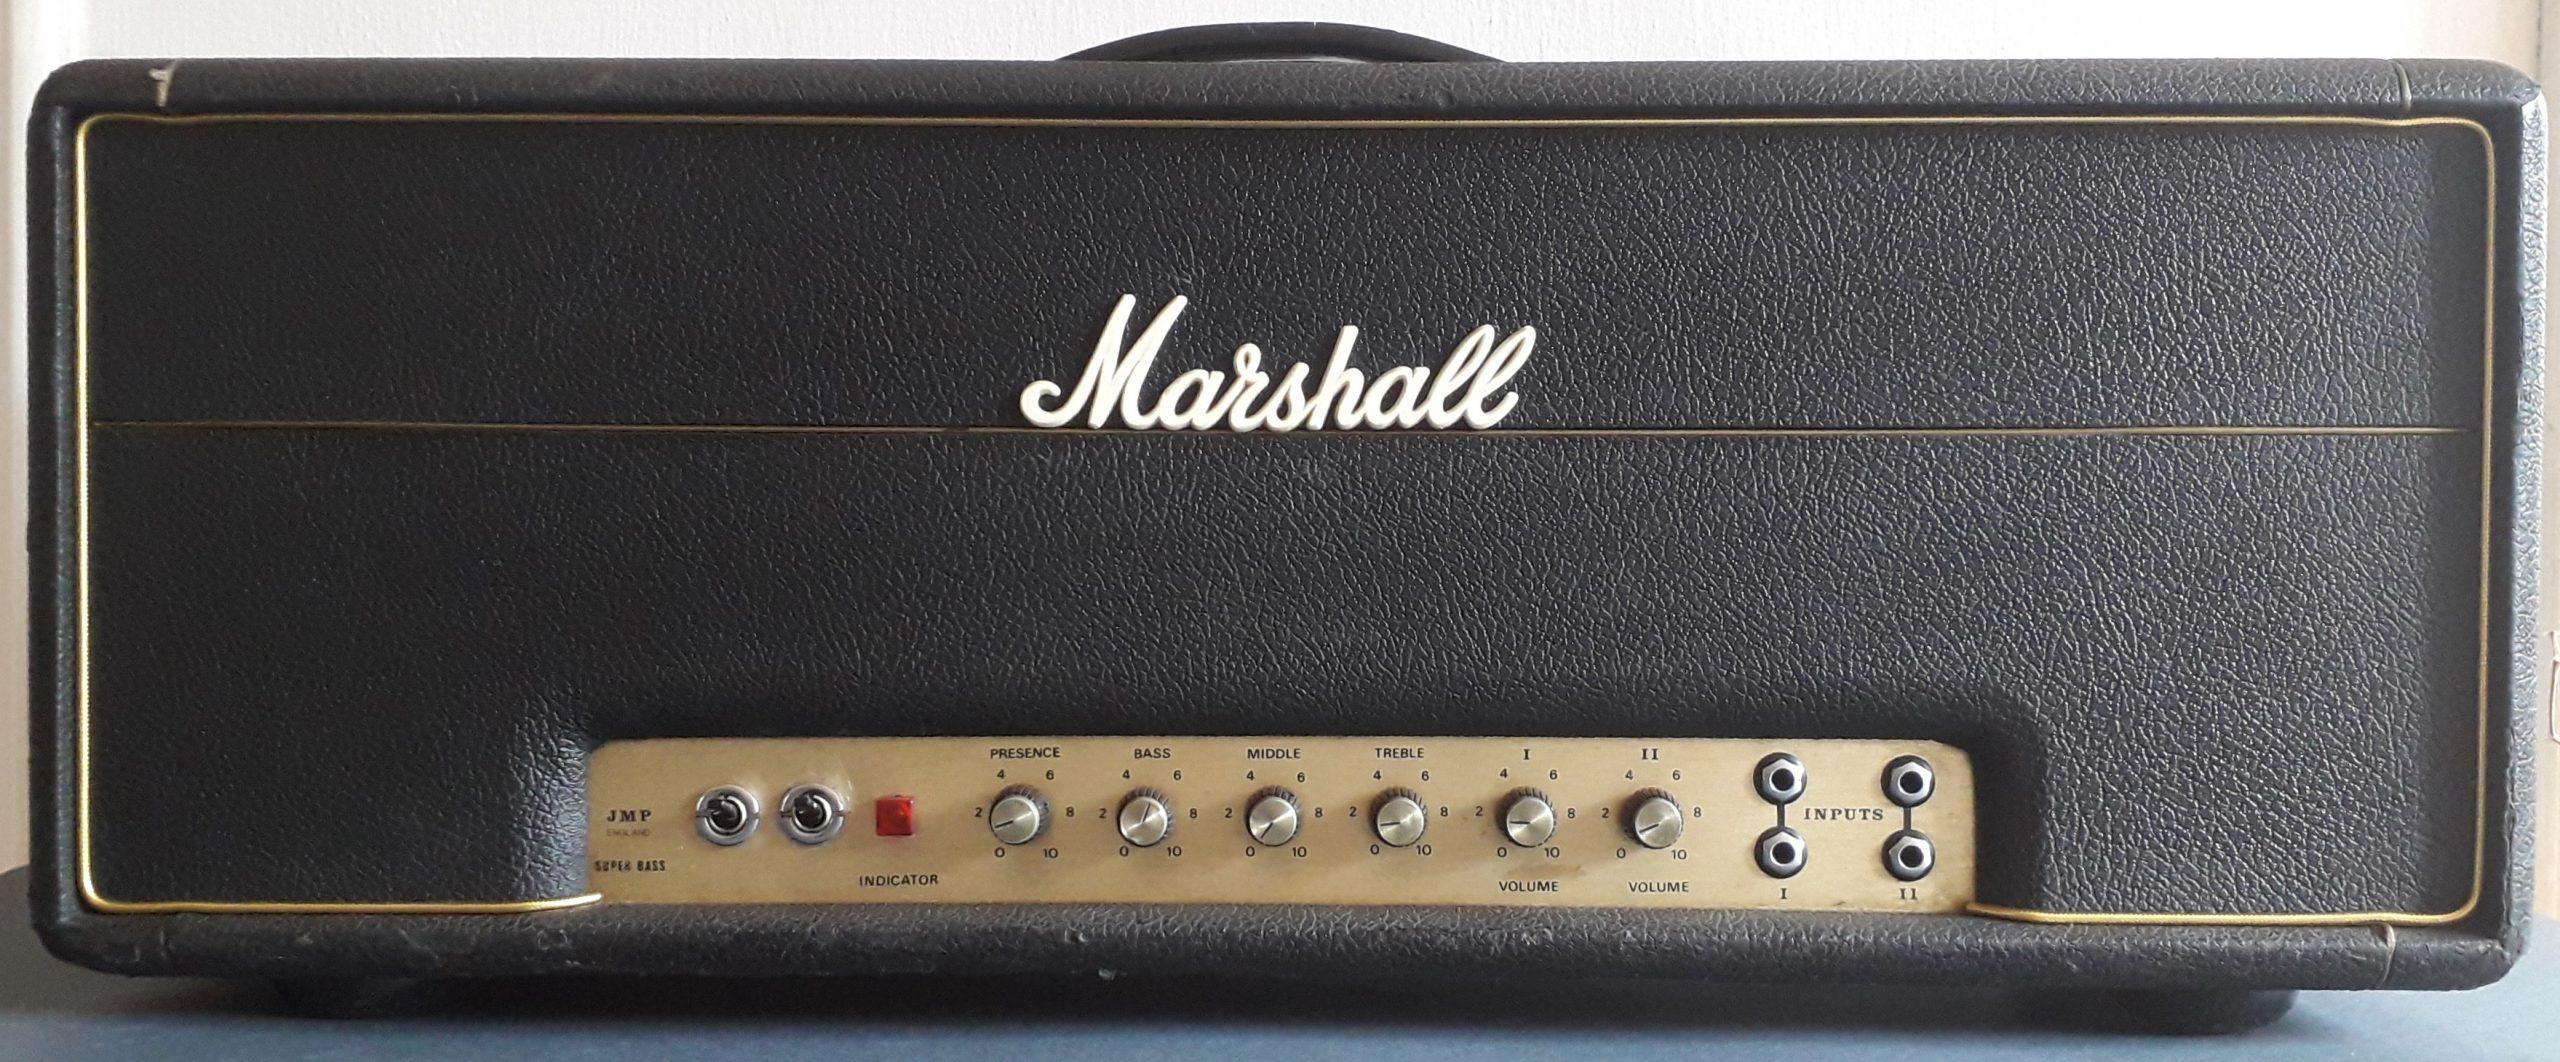 Best valves for Marshall Super Bass 100W amplifier